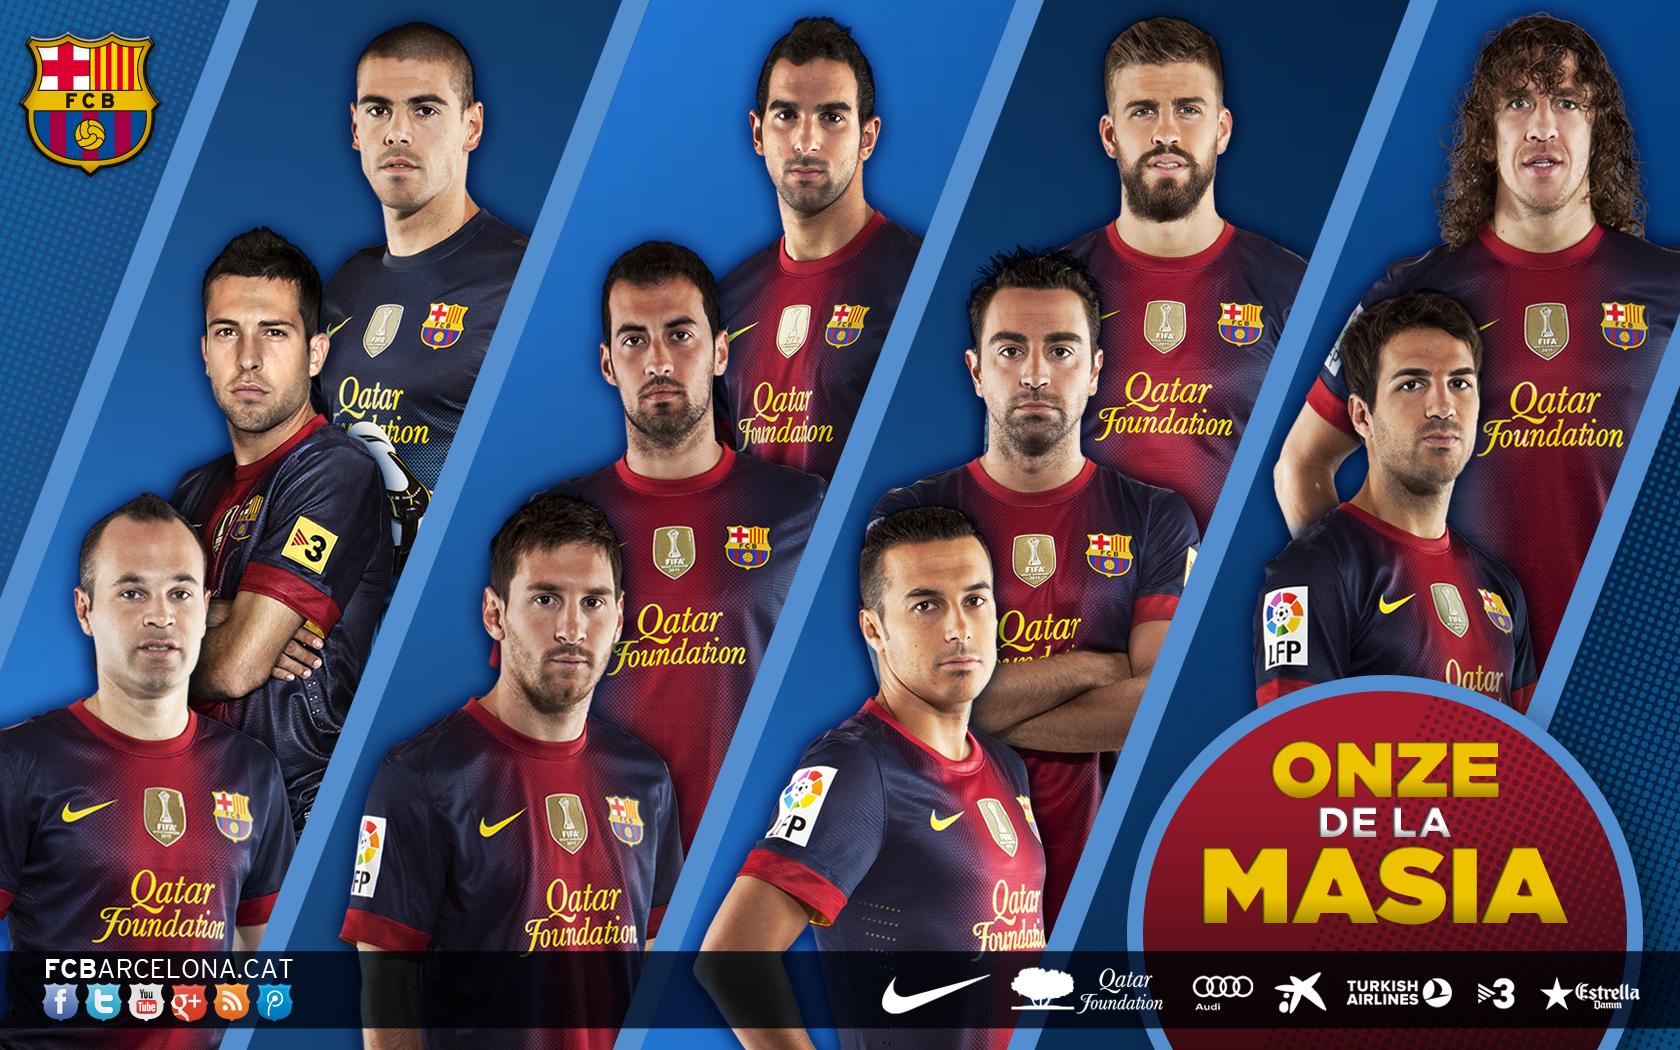 Fc barcelona wallpaper hd 2013 2014 messi wallpapers 2013 2014 fc barcelona wallpaper hd 2013 2014 voltagebd Choice Image